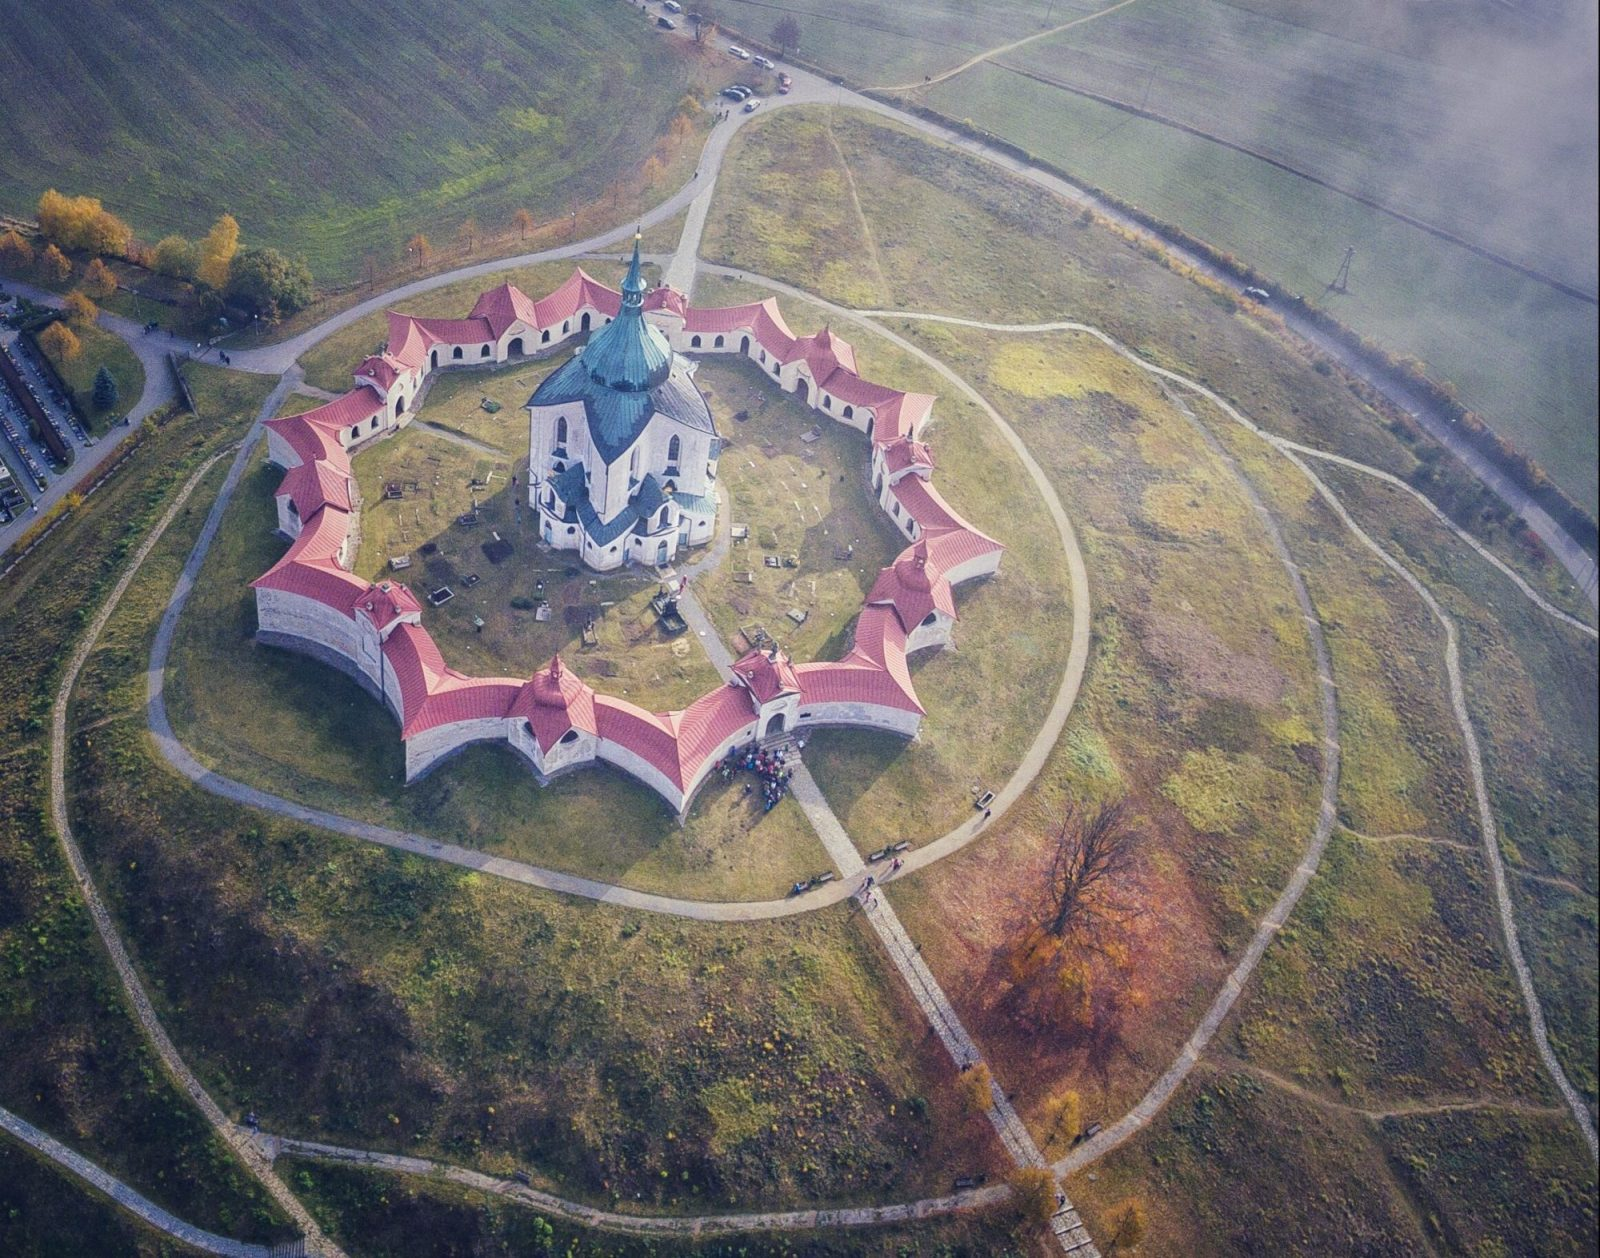 exploring the UNESCO sites in the Czech Republic